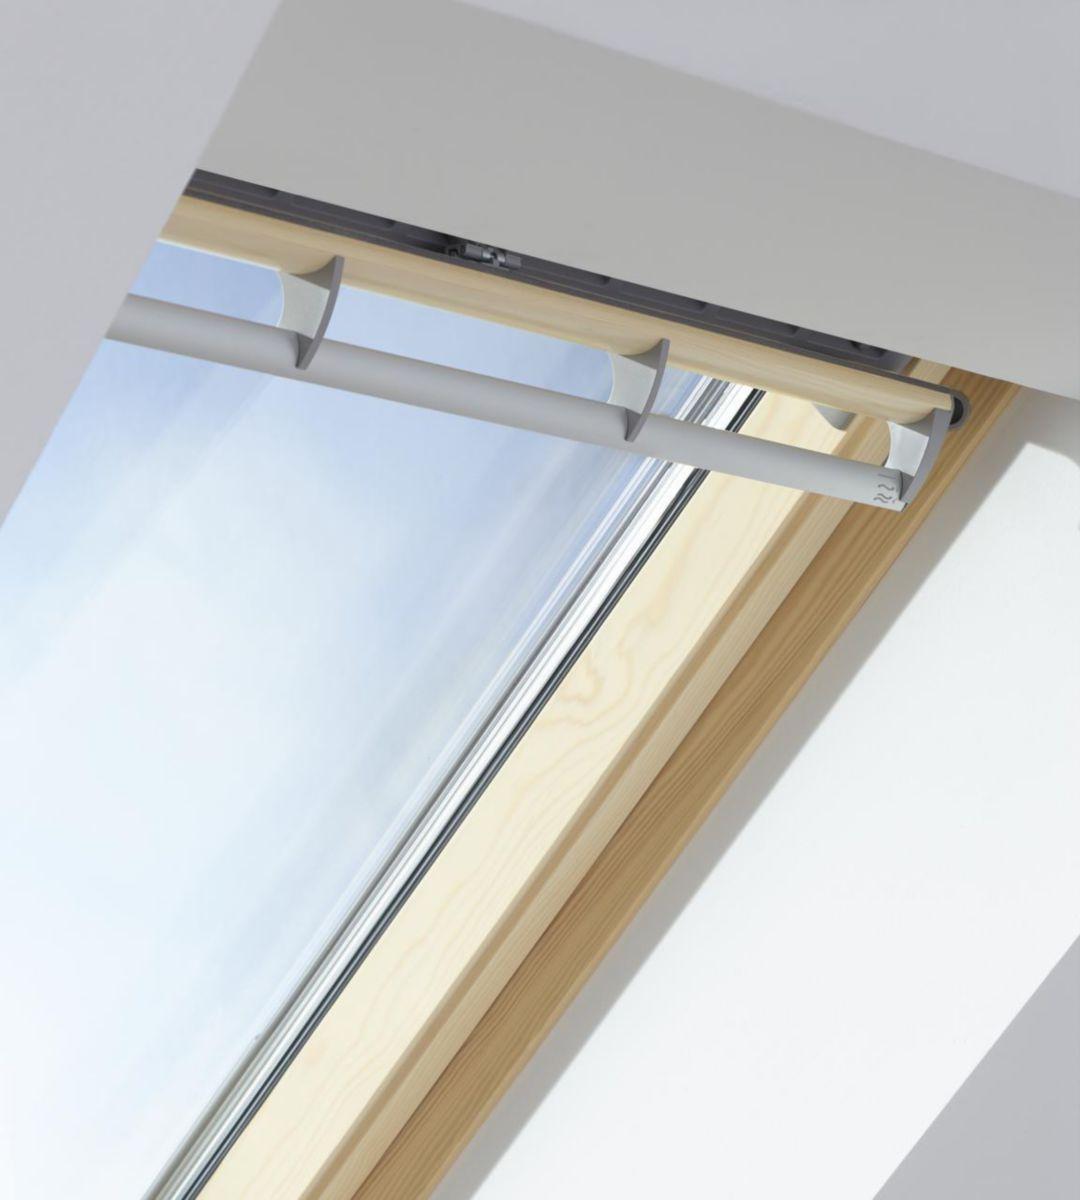 velux fen tre de toit lectrique rotation ggl integra. Black Bedroom Furniture Sets. Home Design Ideas